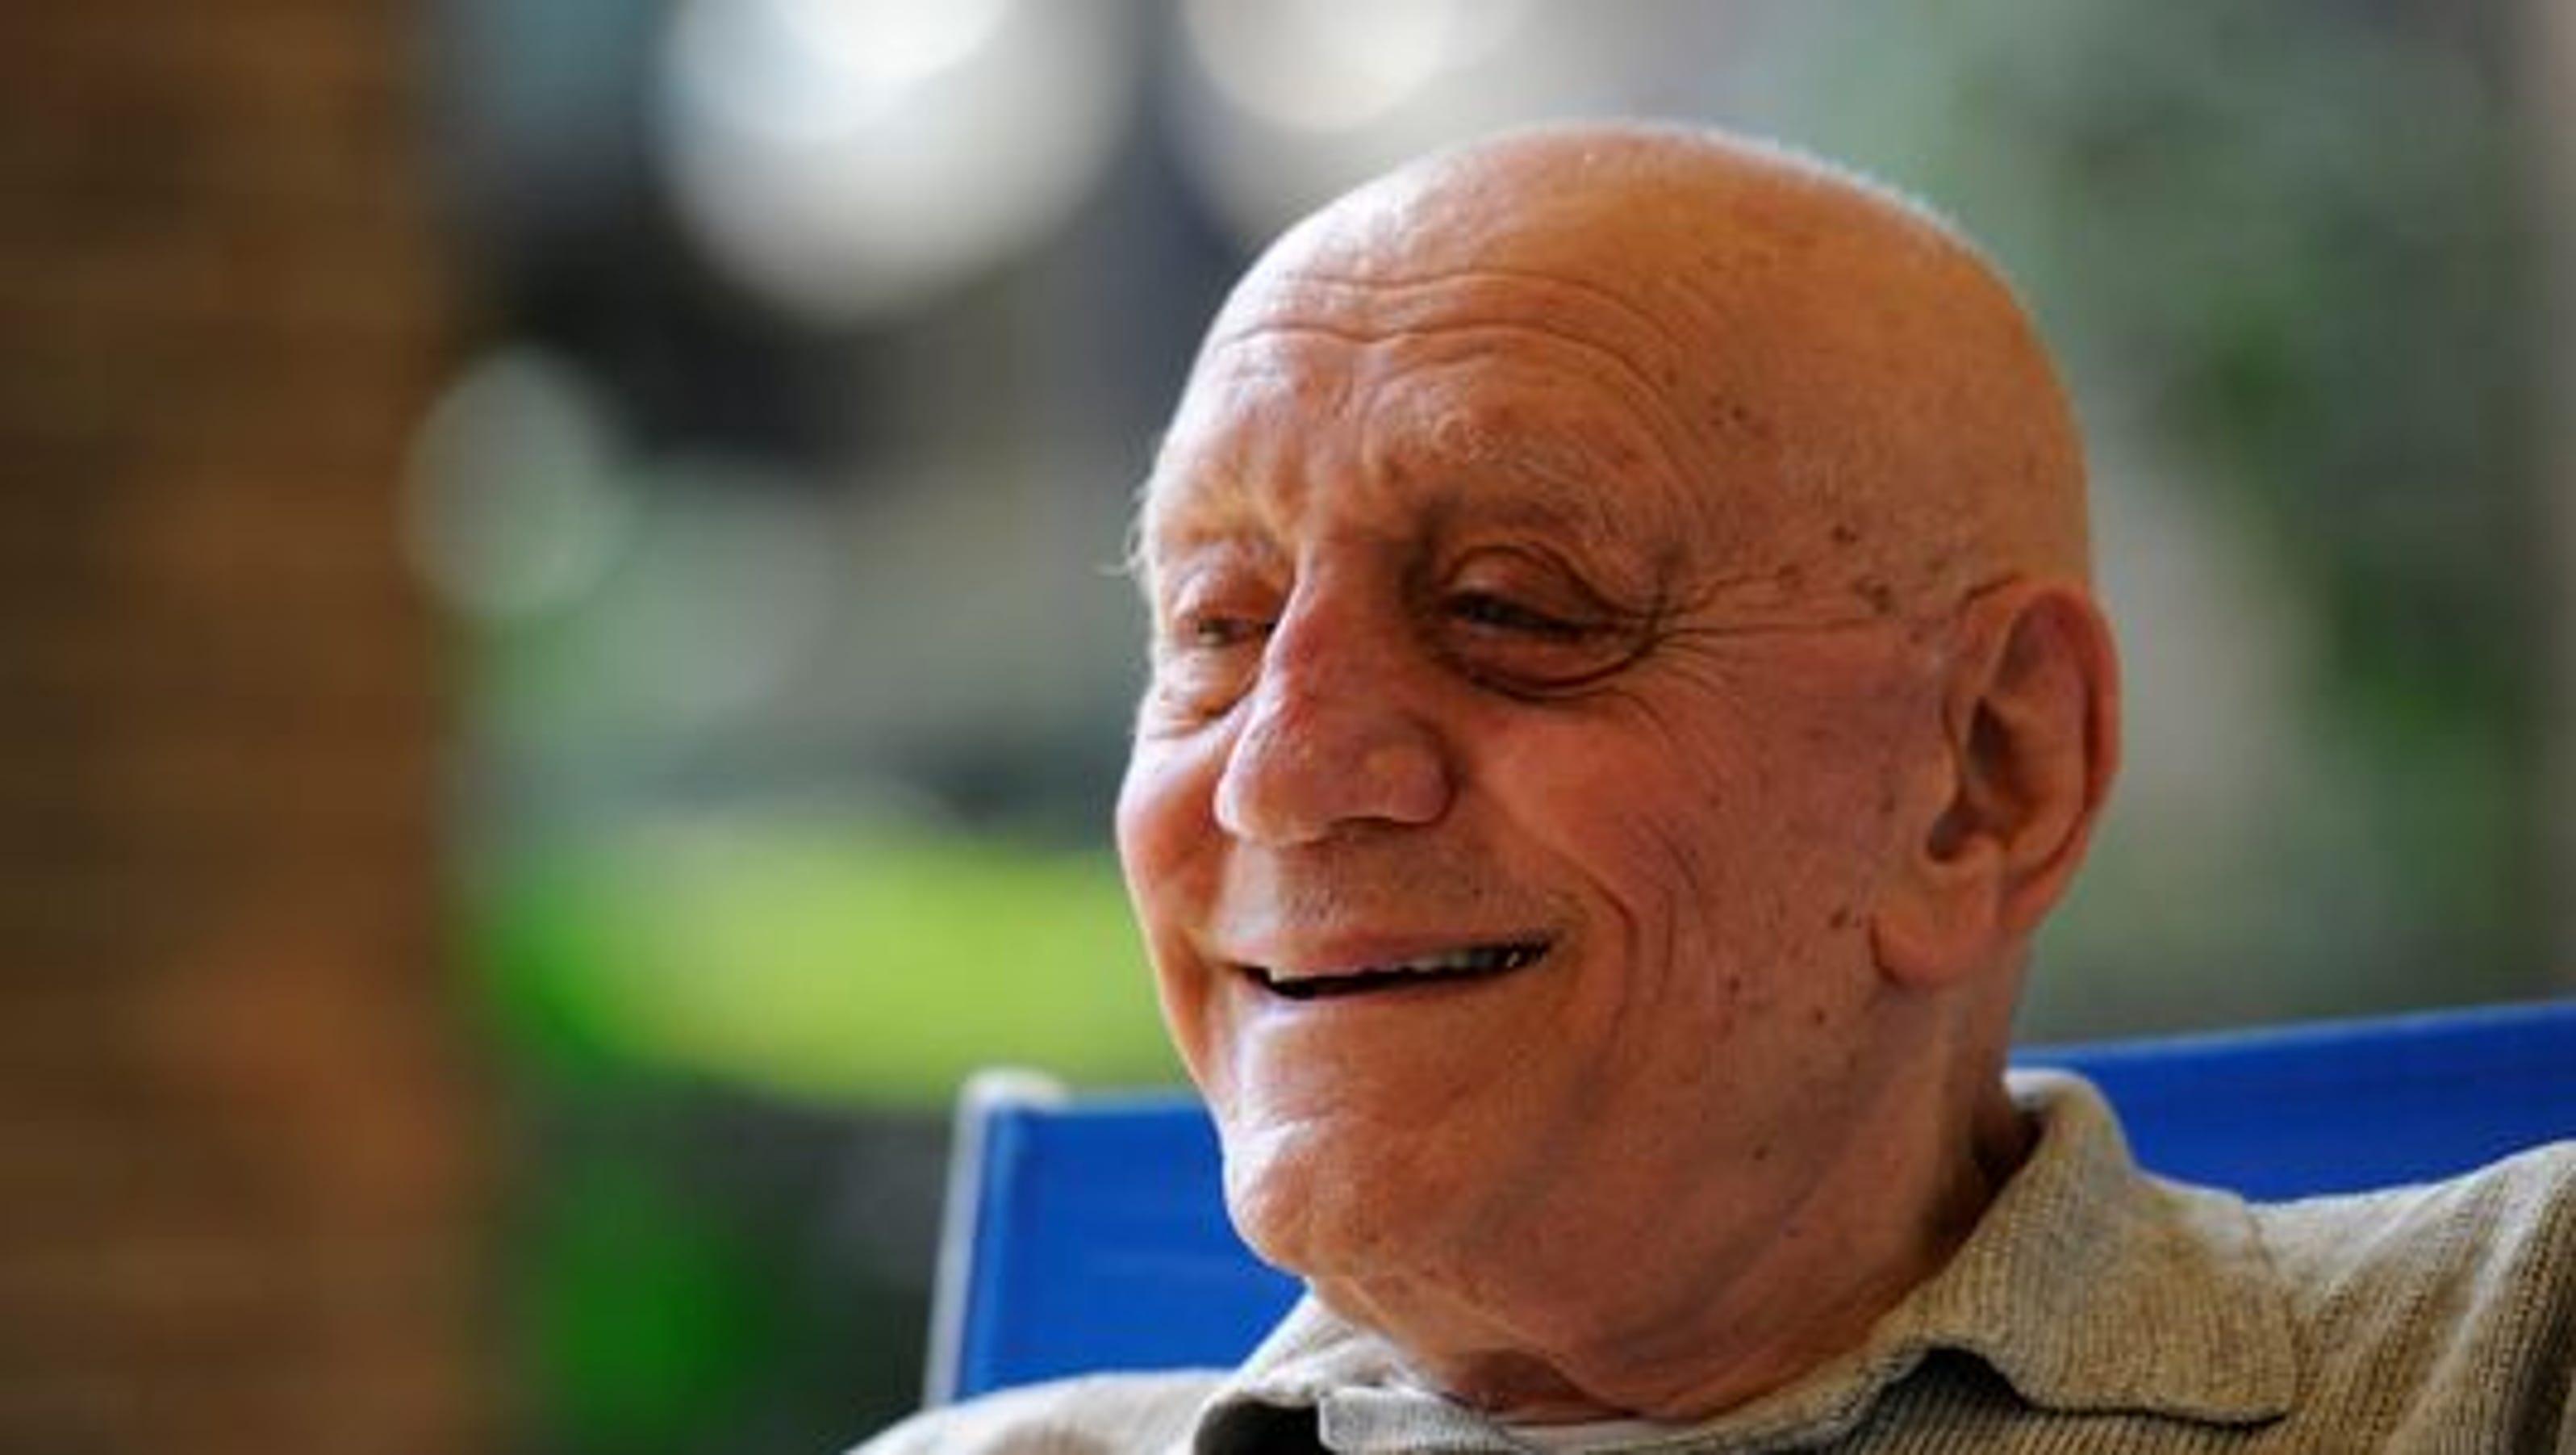 Former UNLV coach Jerry Tarkanian dies at 84